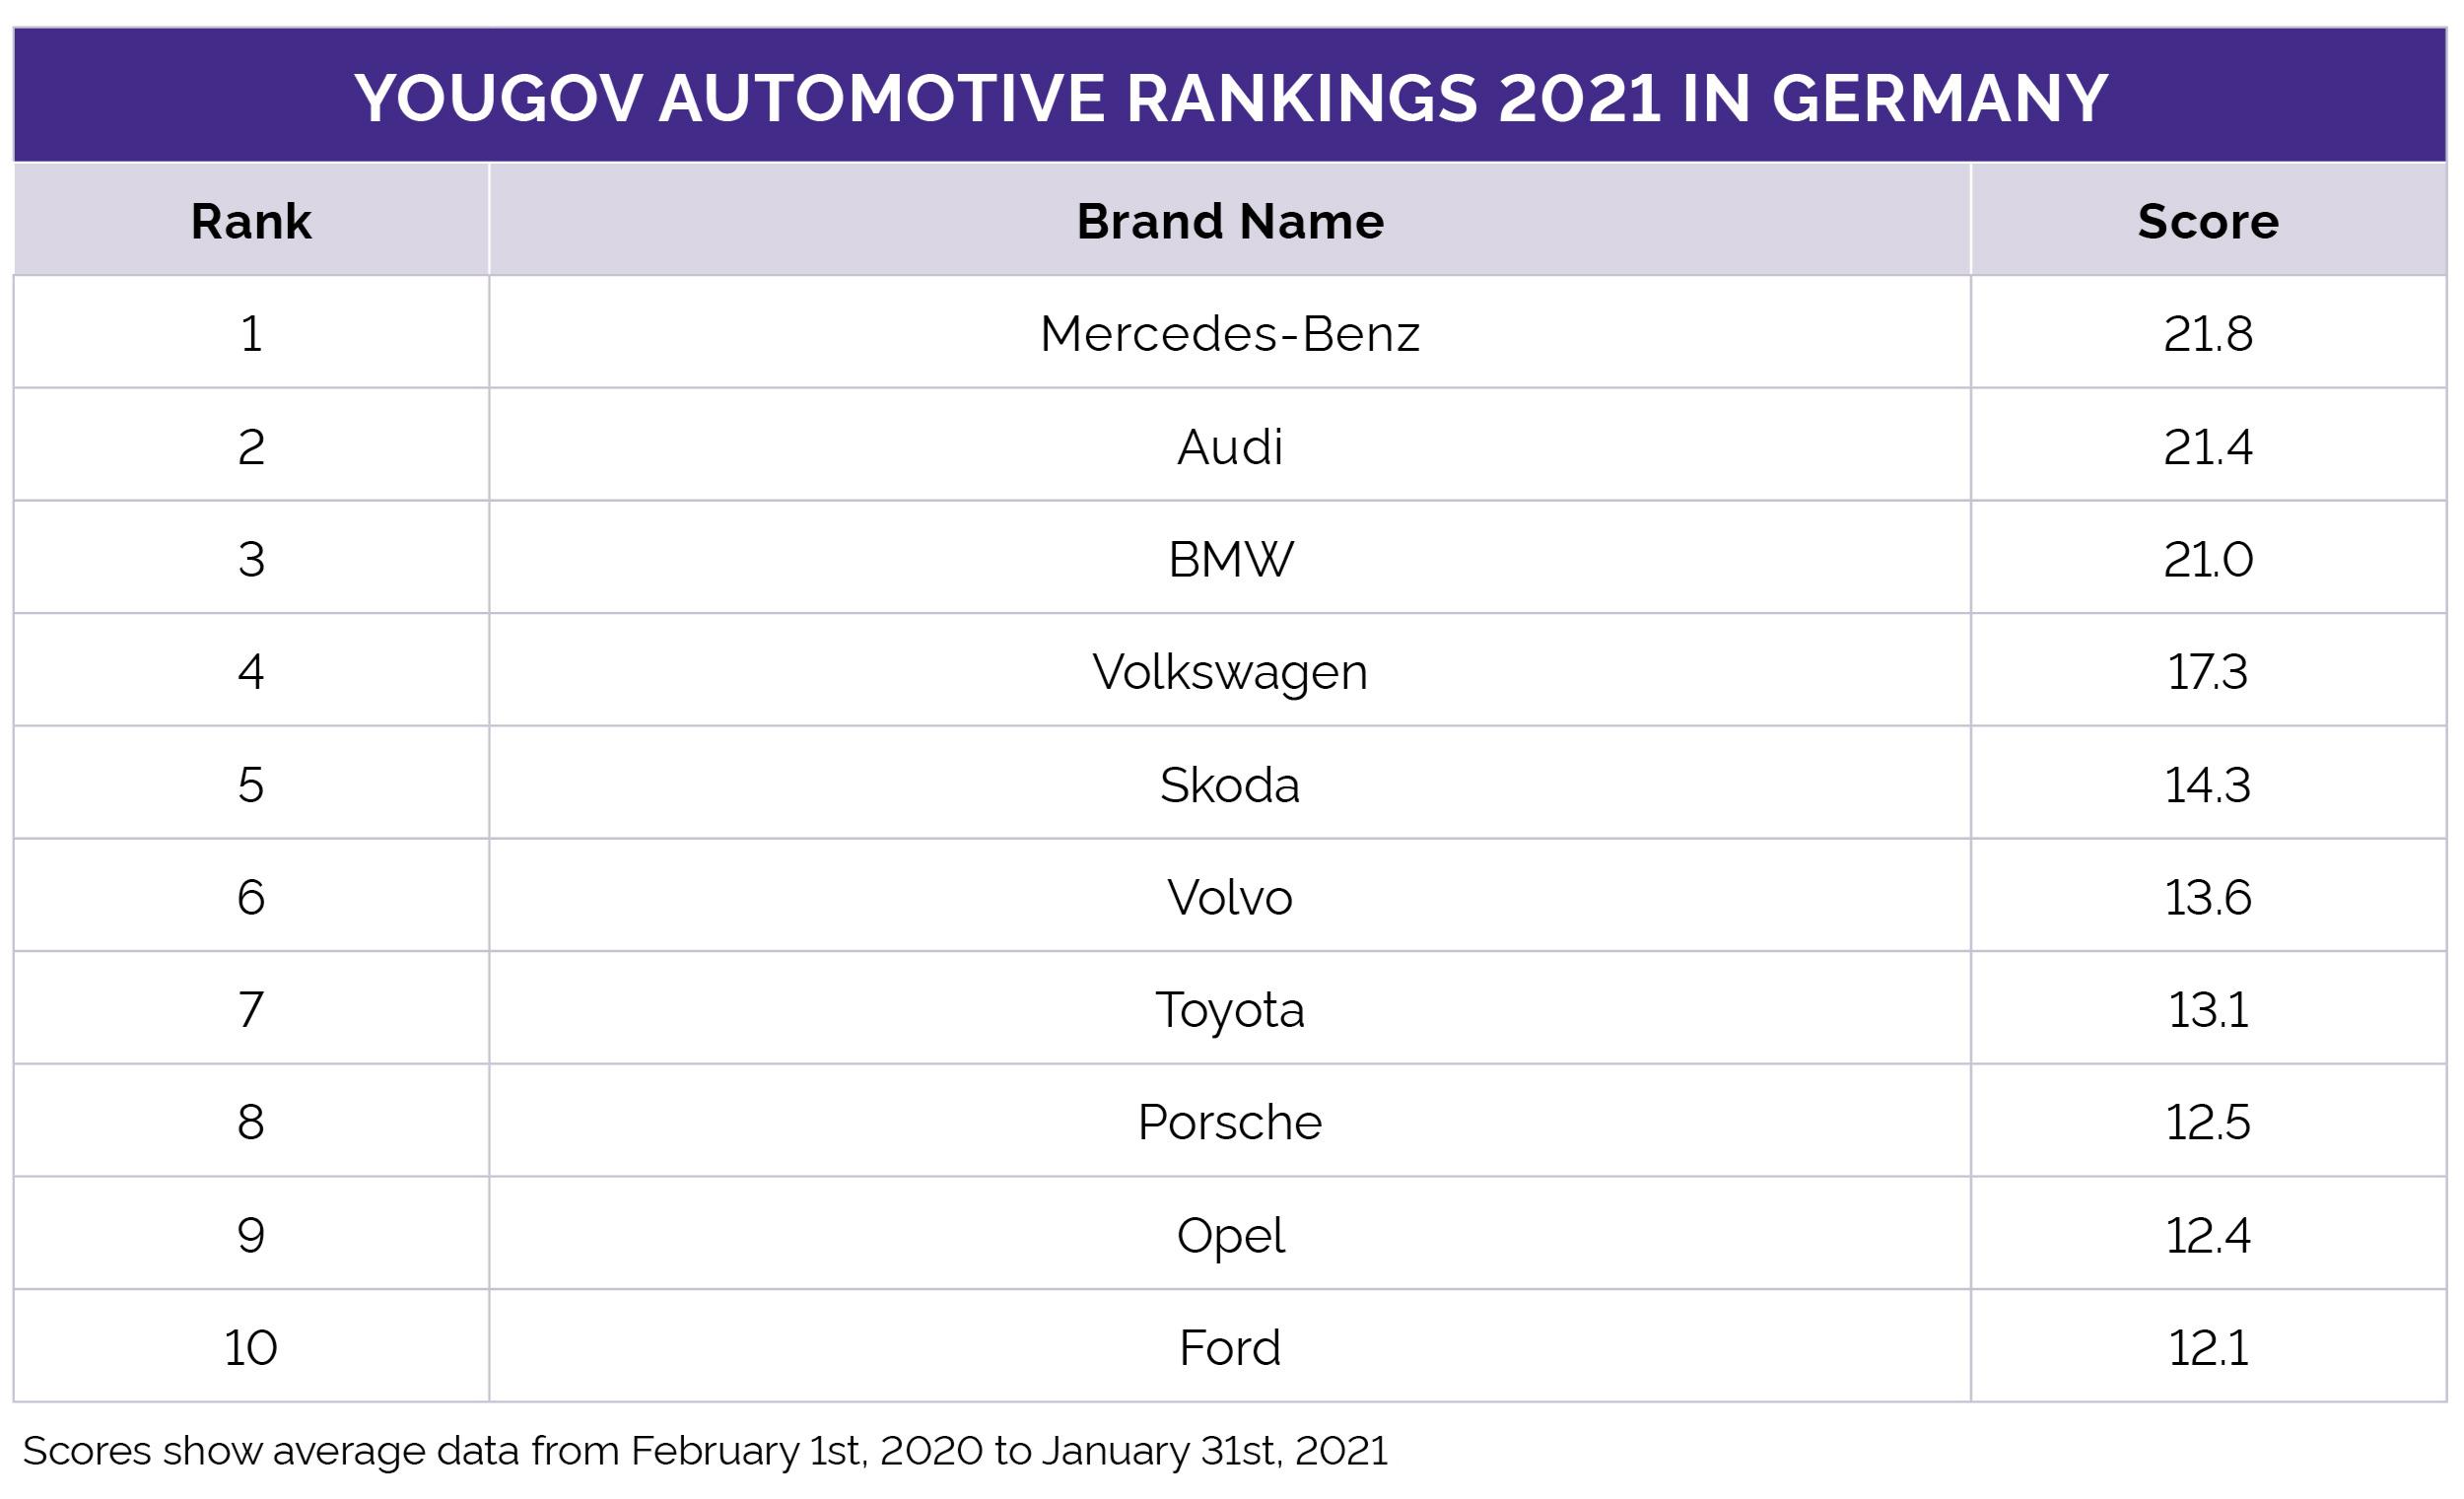 Automotive Ranking Germany 2021